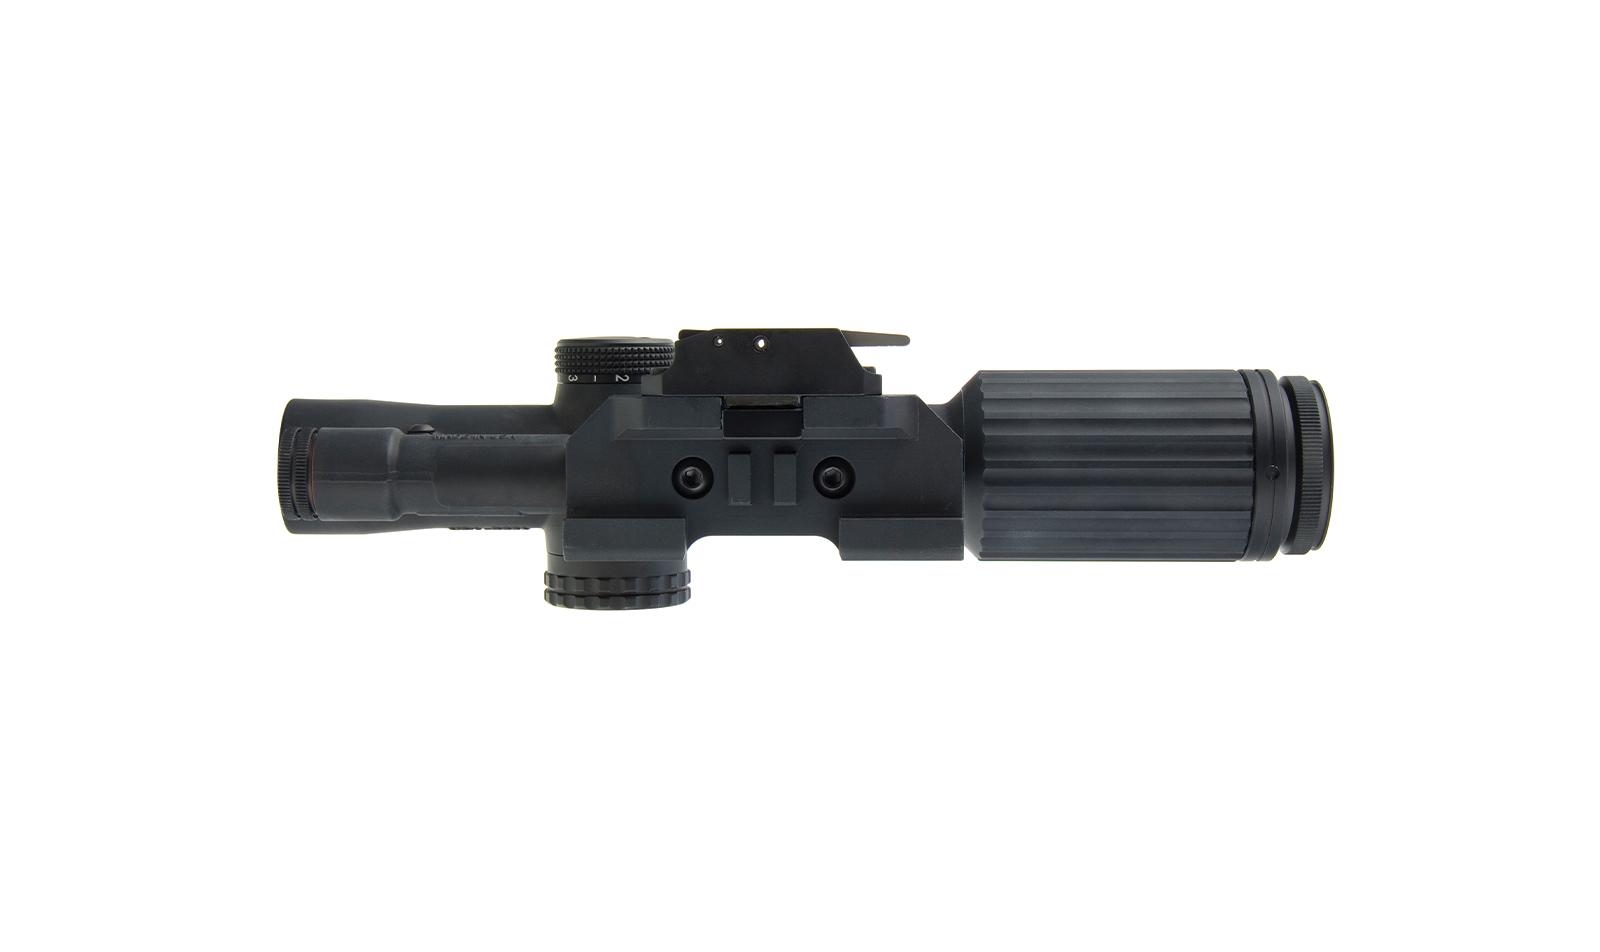 VC16-C-1600051 angle 10